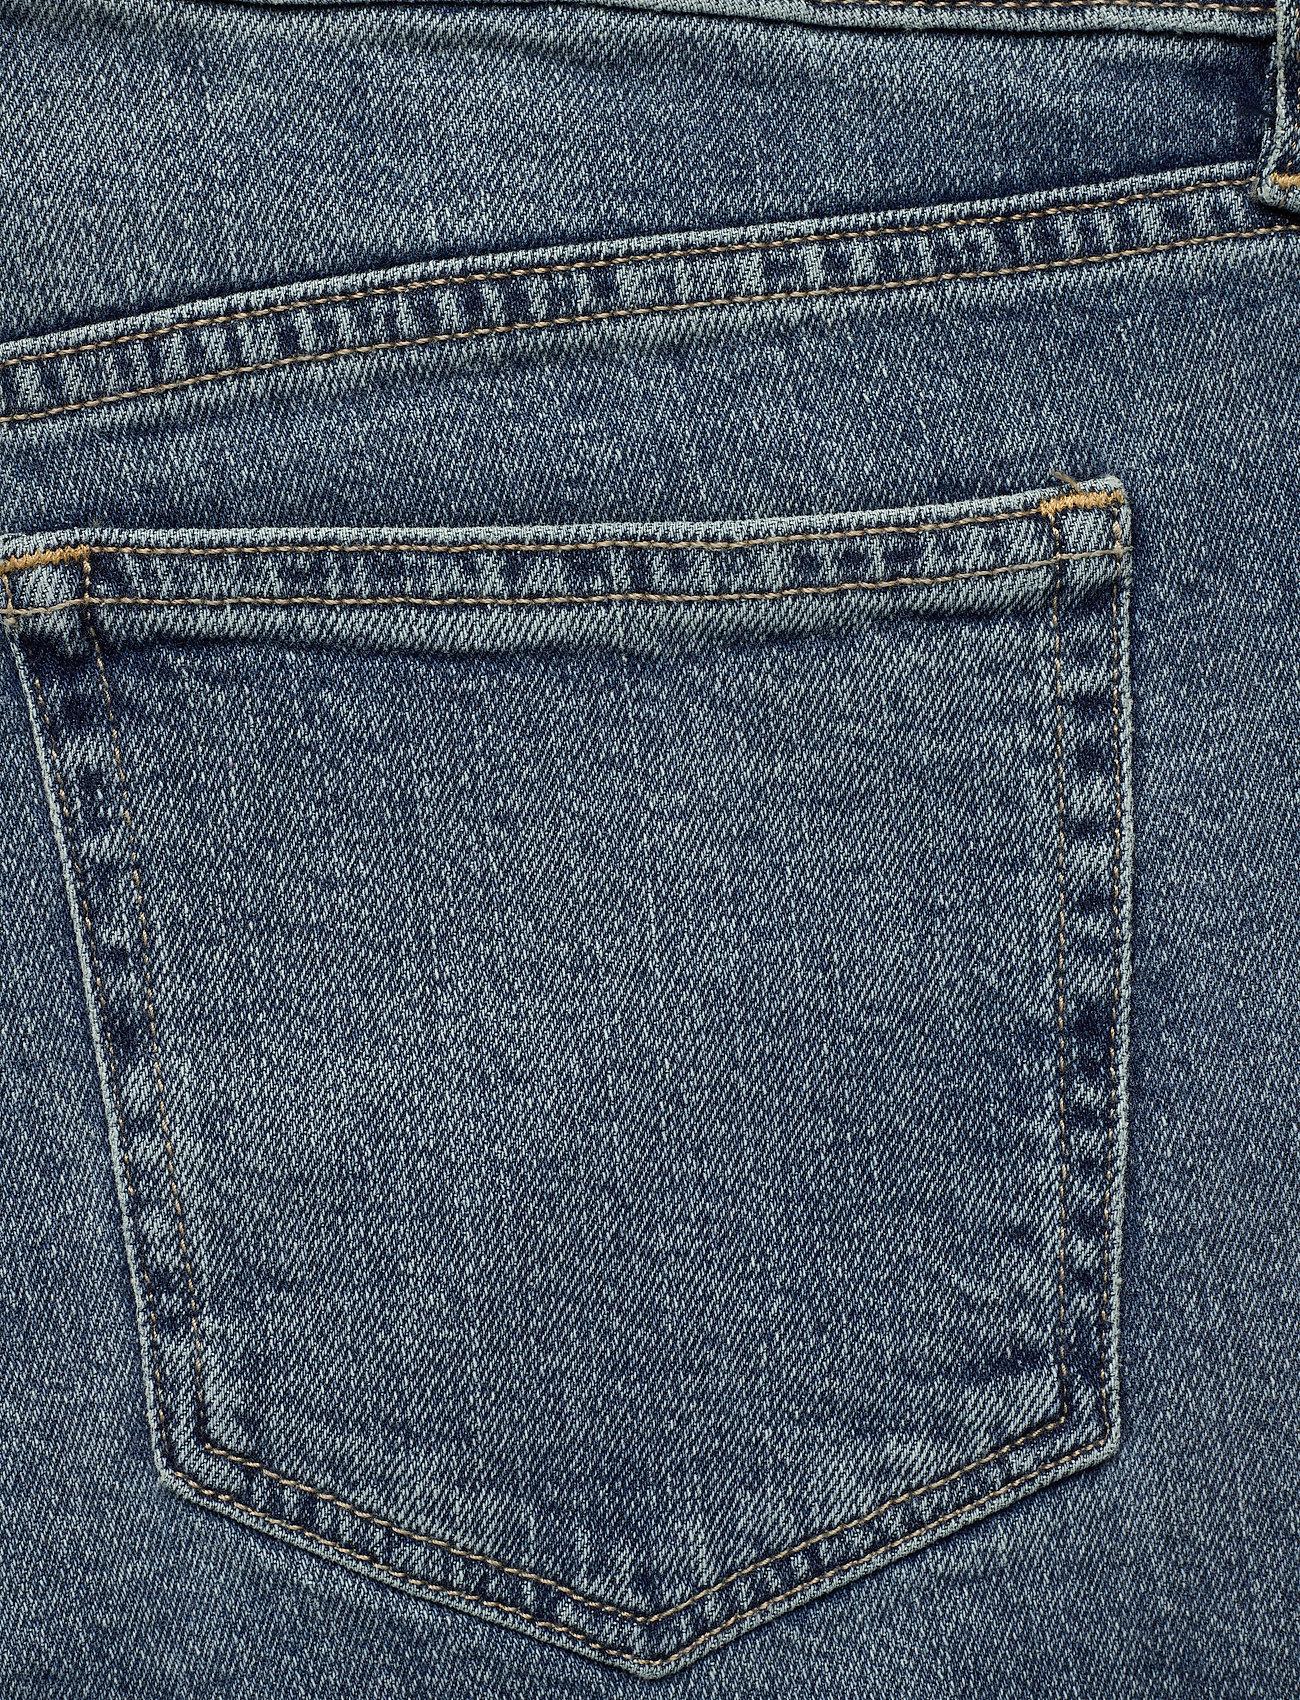 Lauren Ralph Lauren Estate Jean - Jeans LIGHT TINTED WASH - Dameklær Spesialtilbud